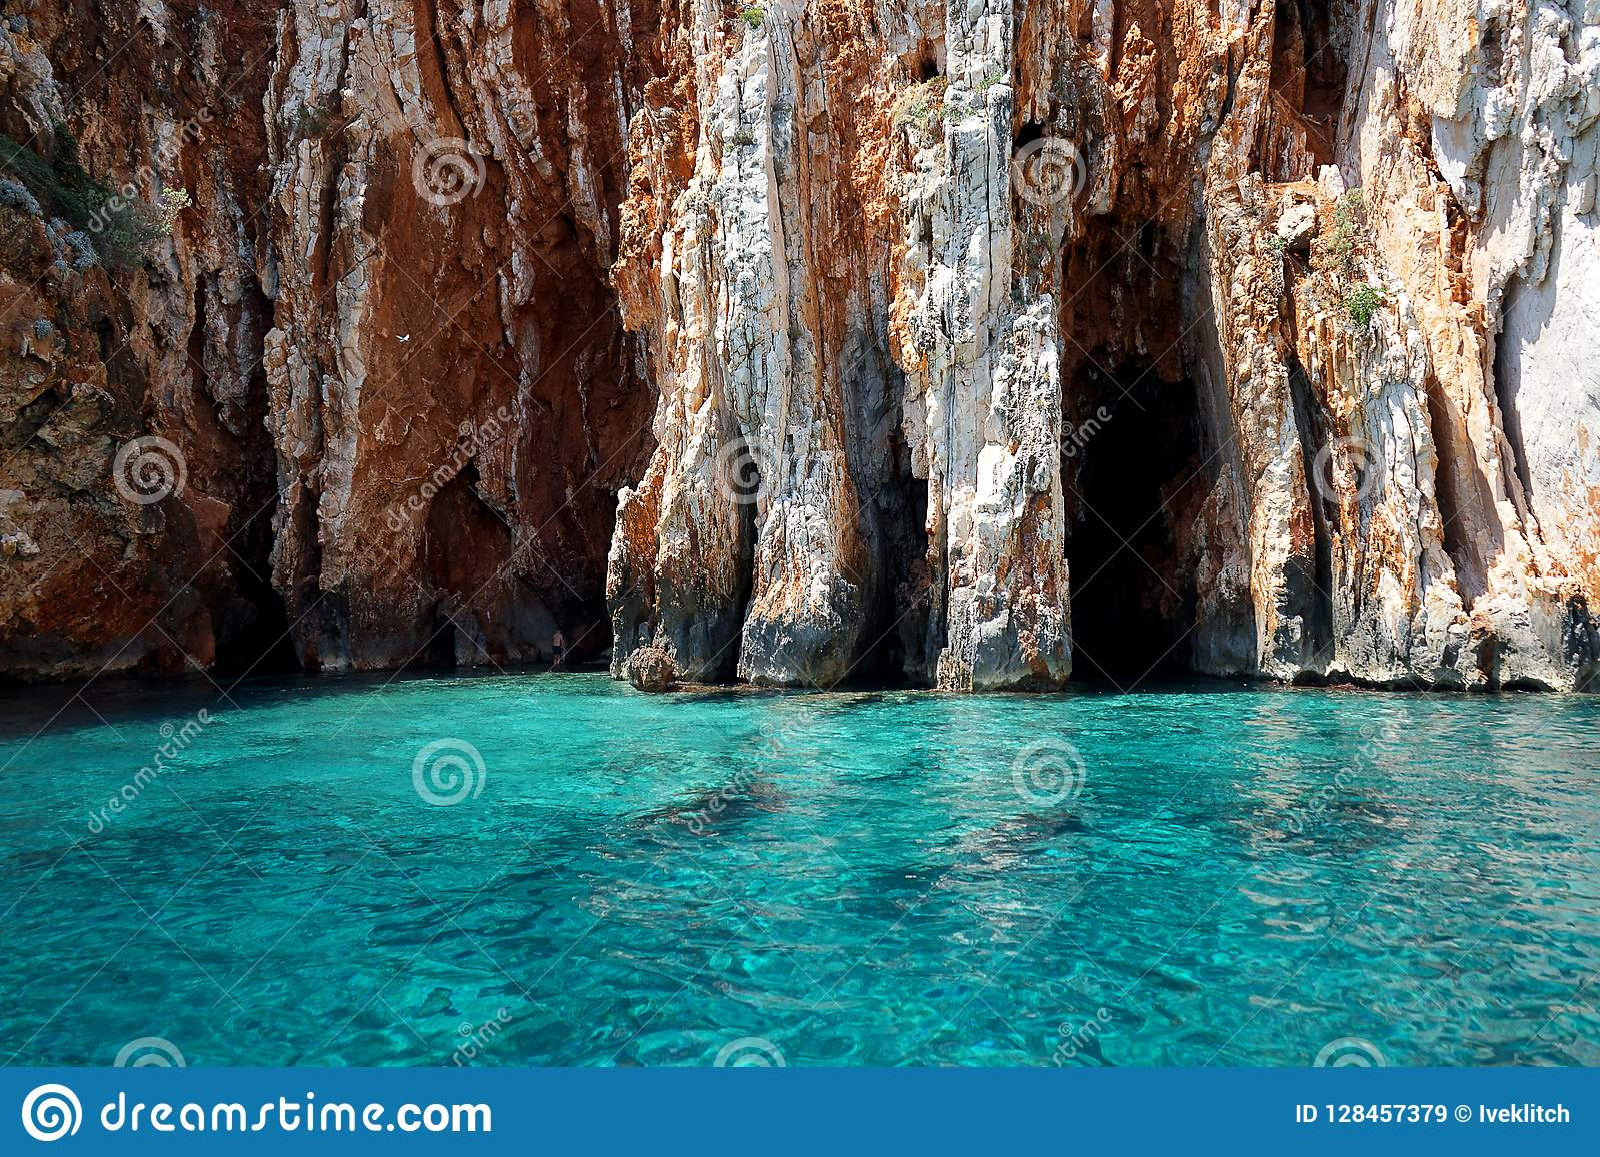 Seascape η άποψη στα τυρκουάζ νερά της αδριατικής θάλασσας στο νησί Hvar Κροατία, μπλε ανασκάπτει Διάσημος προορισμός ταξιδιού να